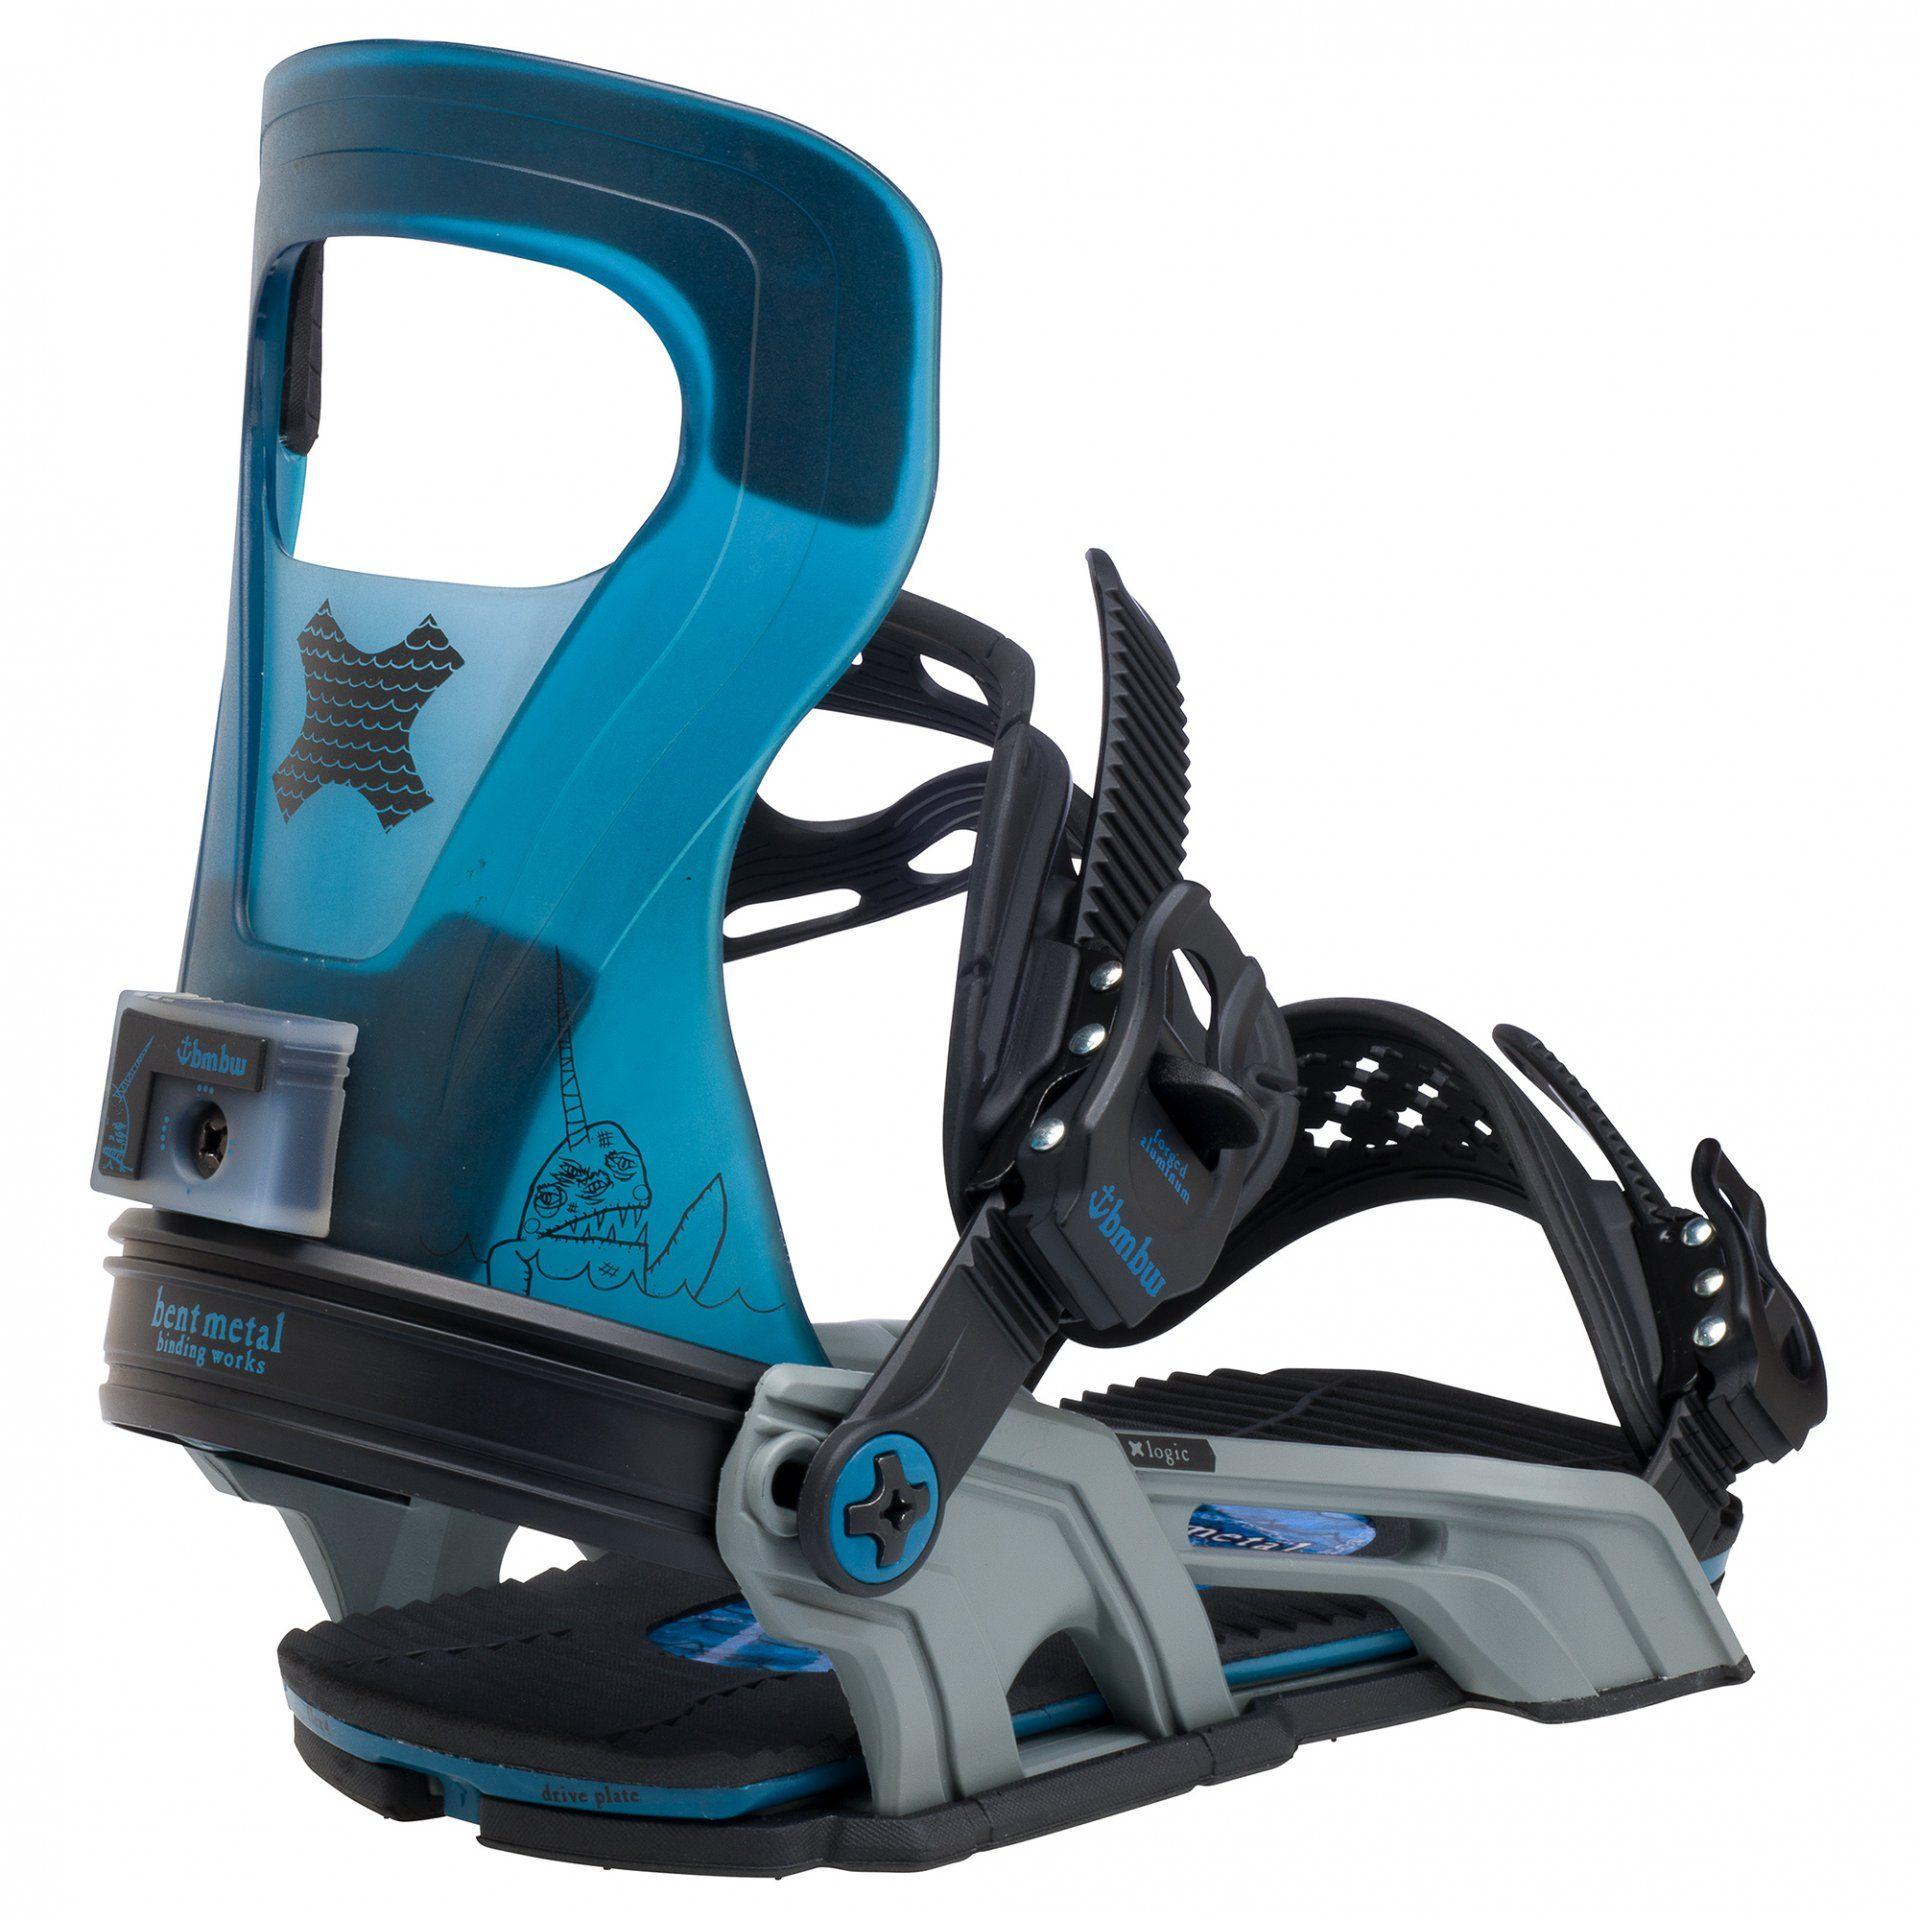 WIĄZANIA SNOWBOARDOWE BENT METAL LOGIC 20BN004 BLUE 2